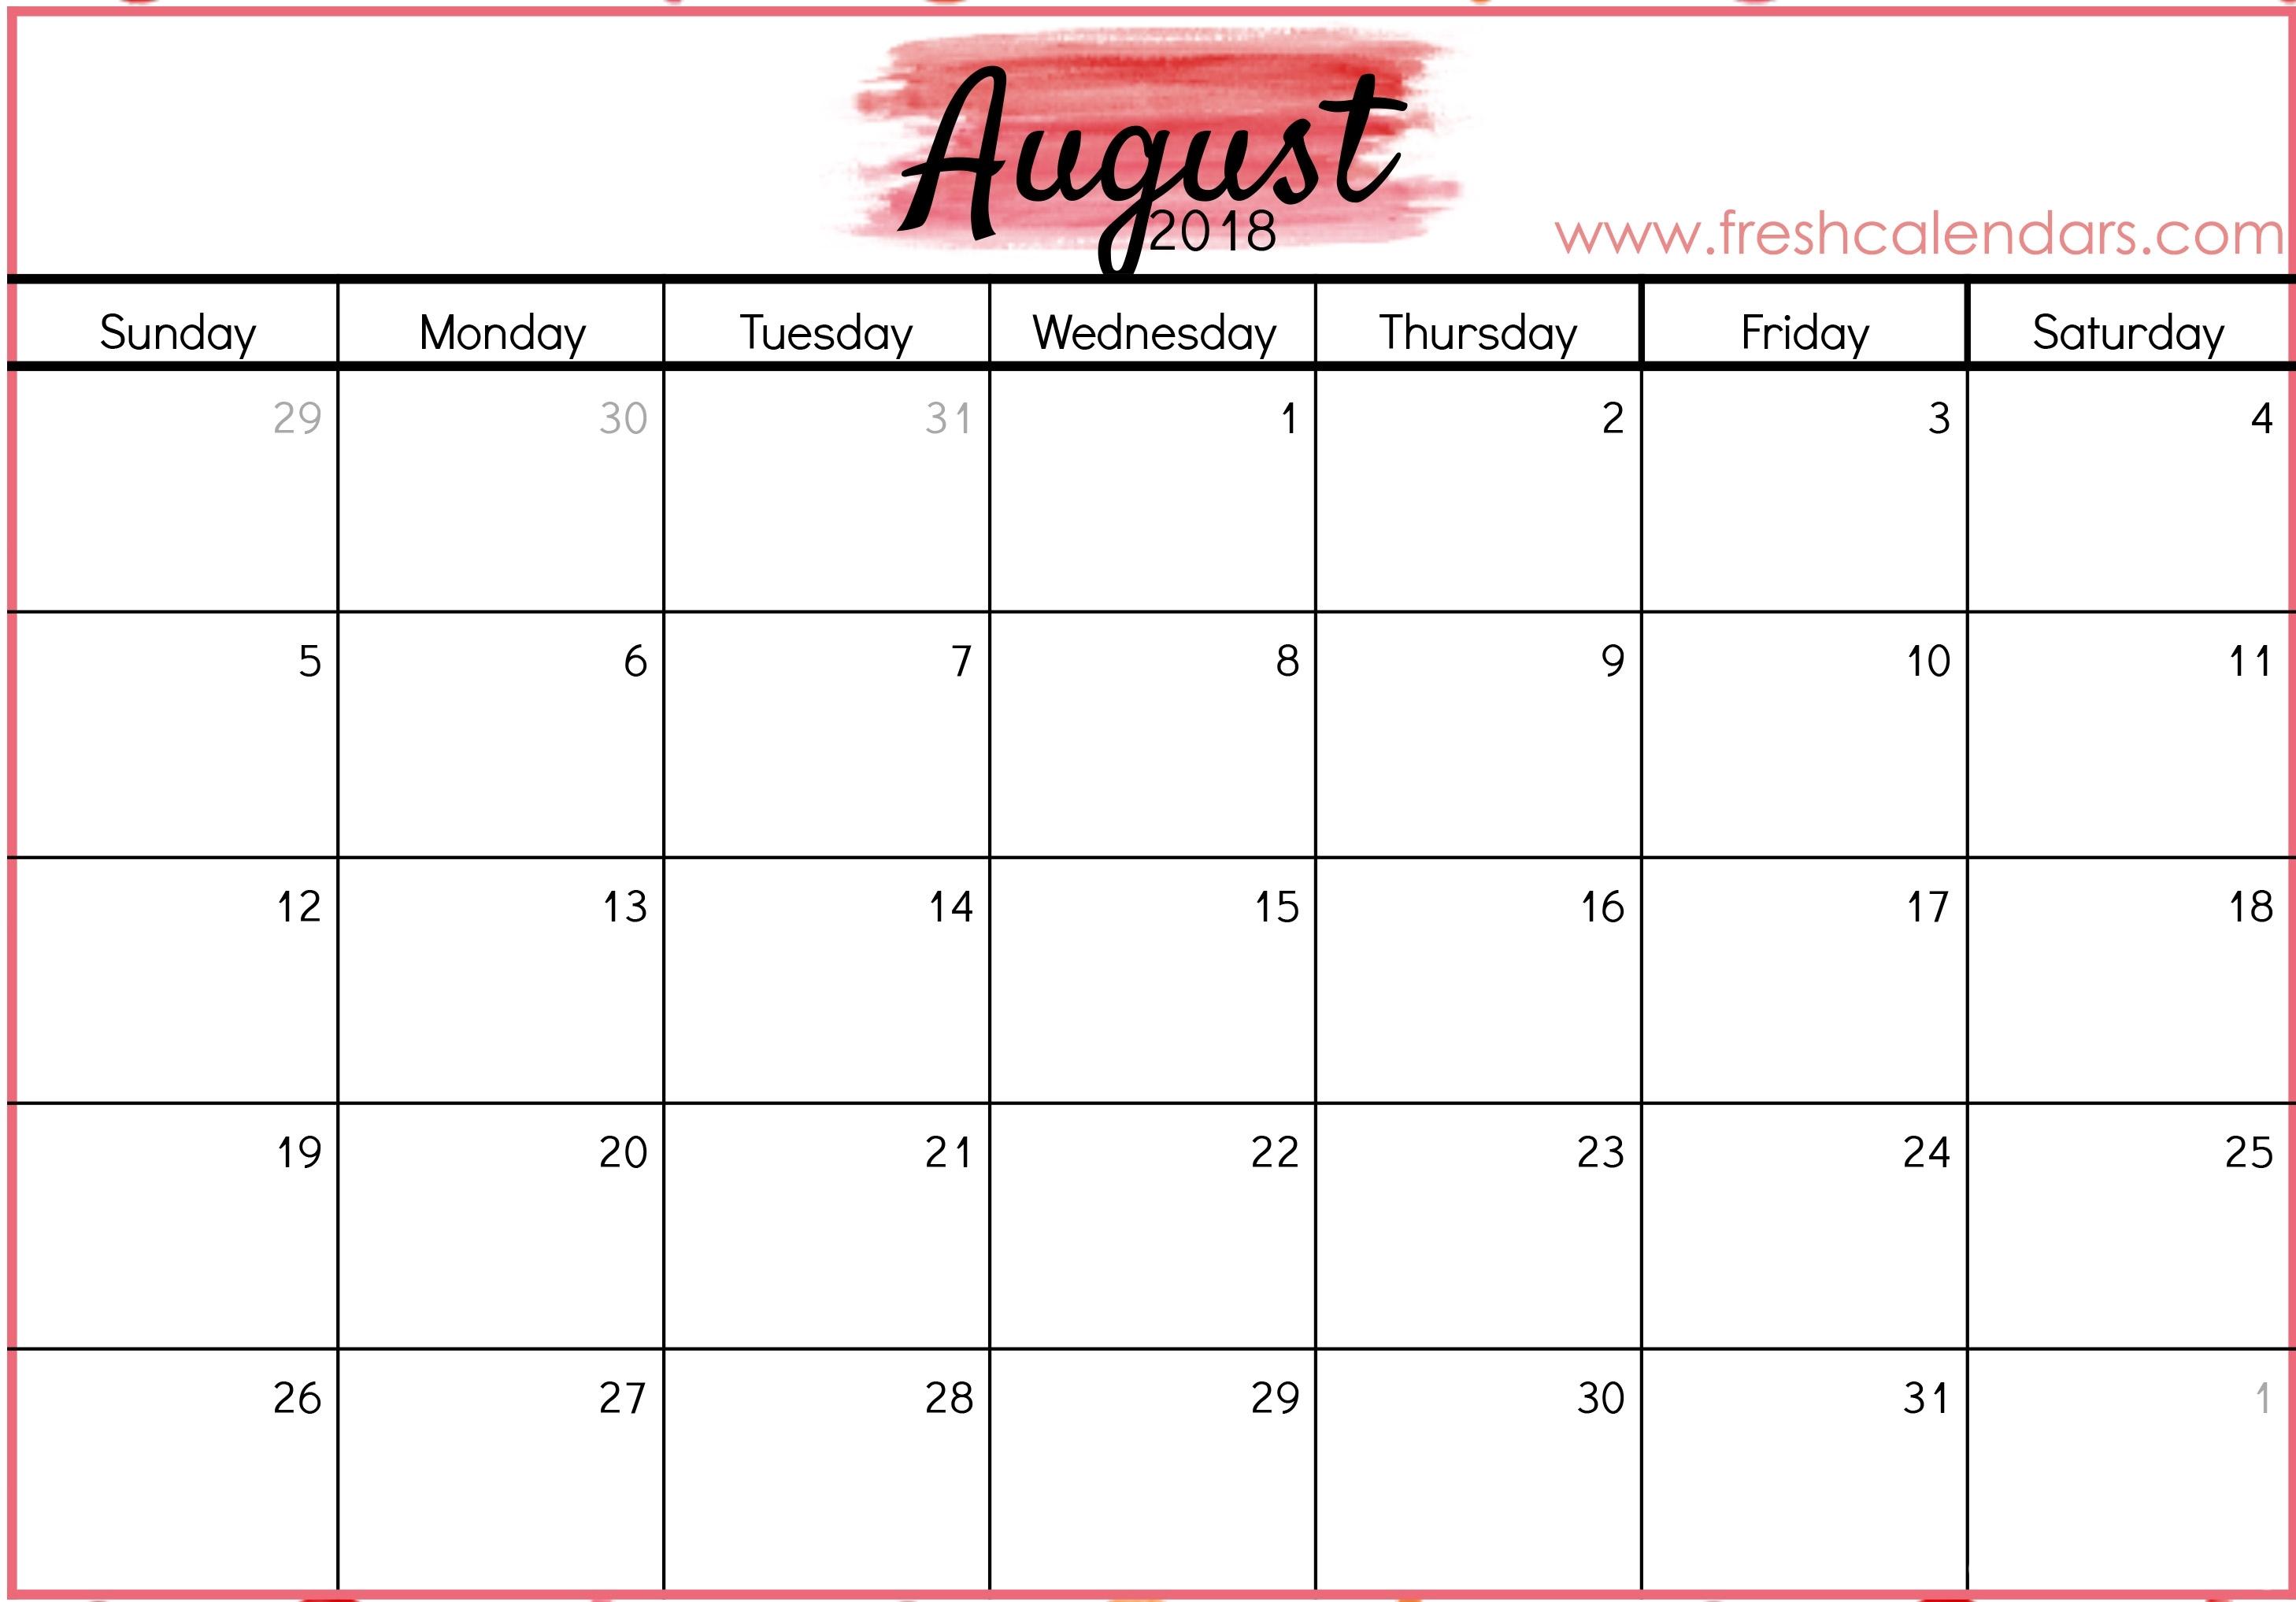 August 2018 Calendar Printable - Fresh Calendars pertaining to August Calendar Printable 2 Month On One Page